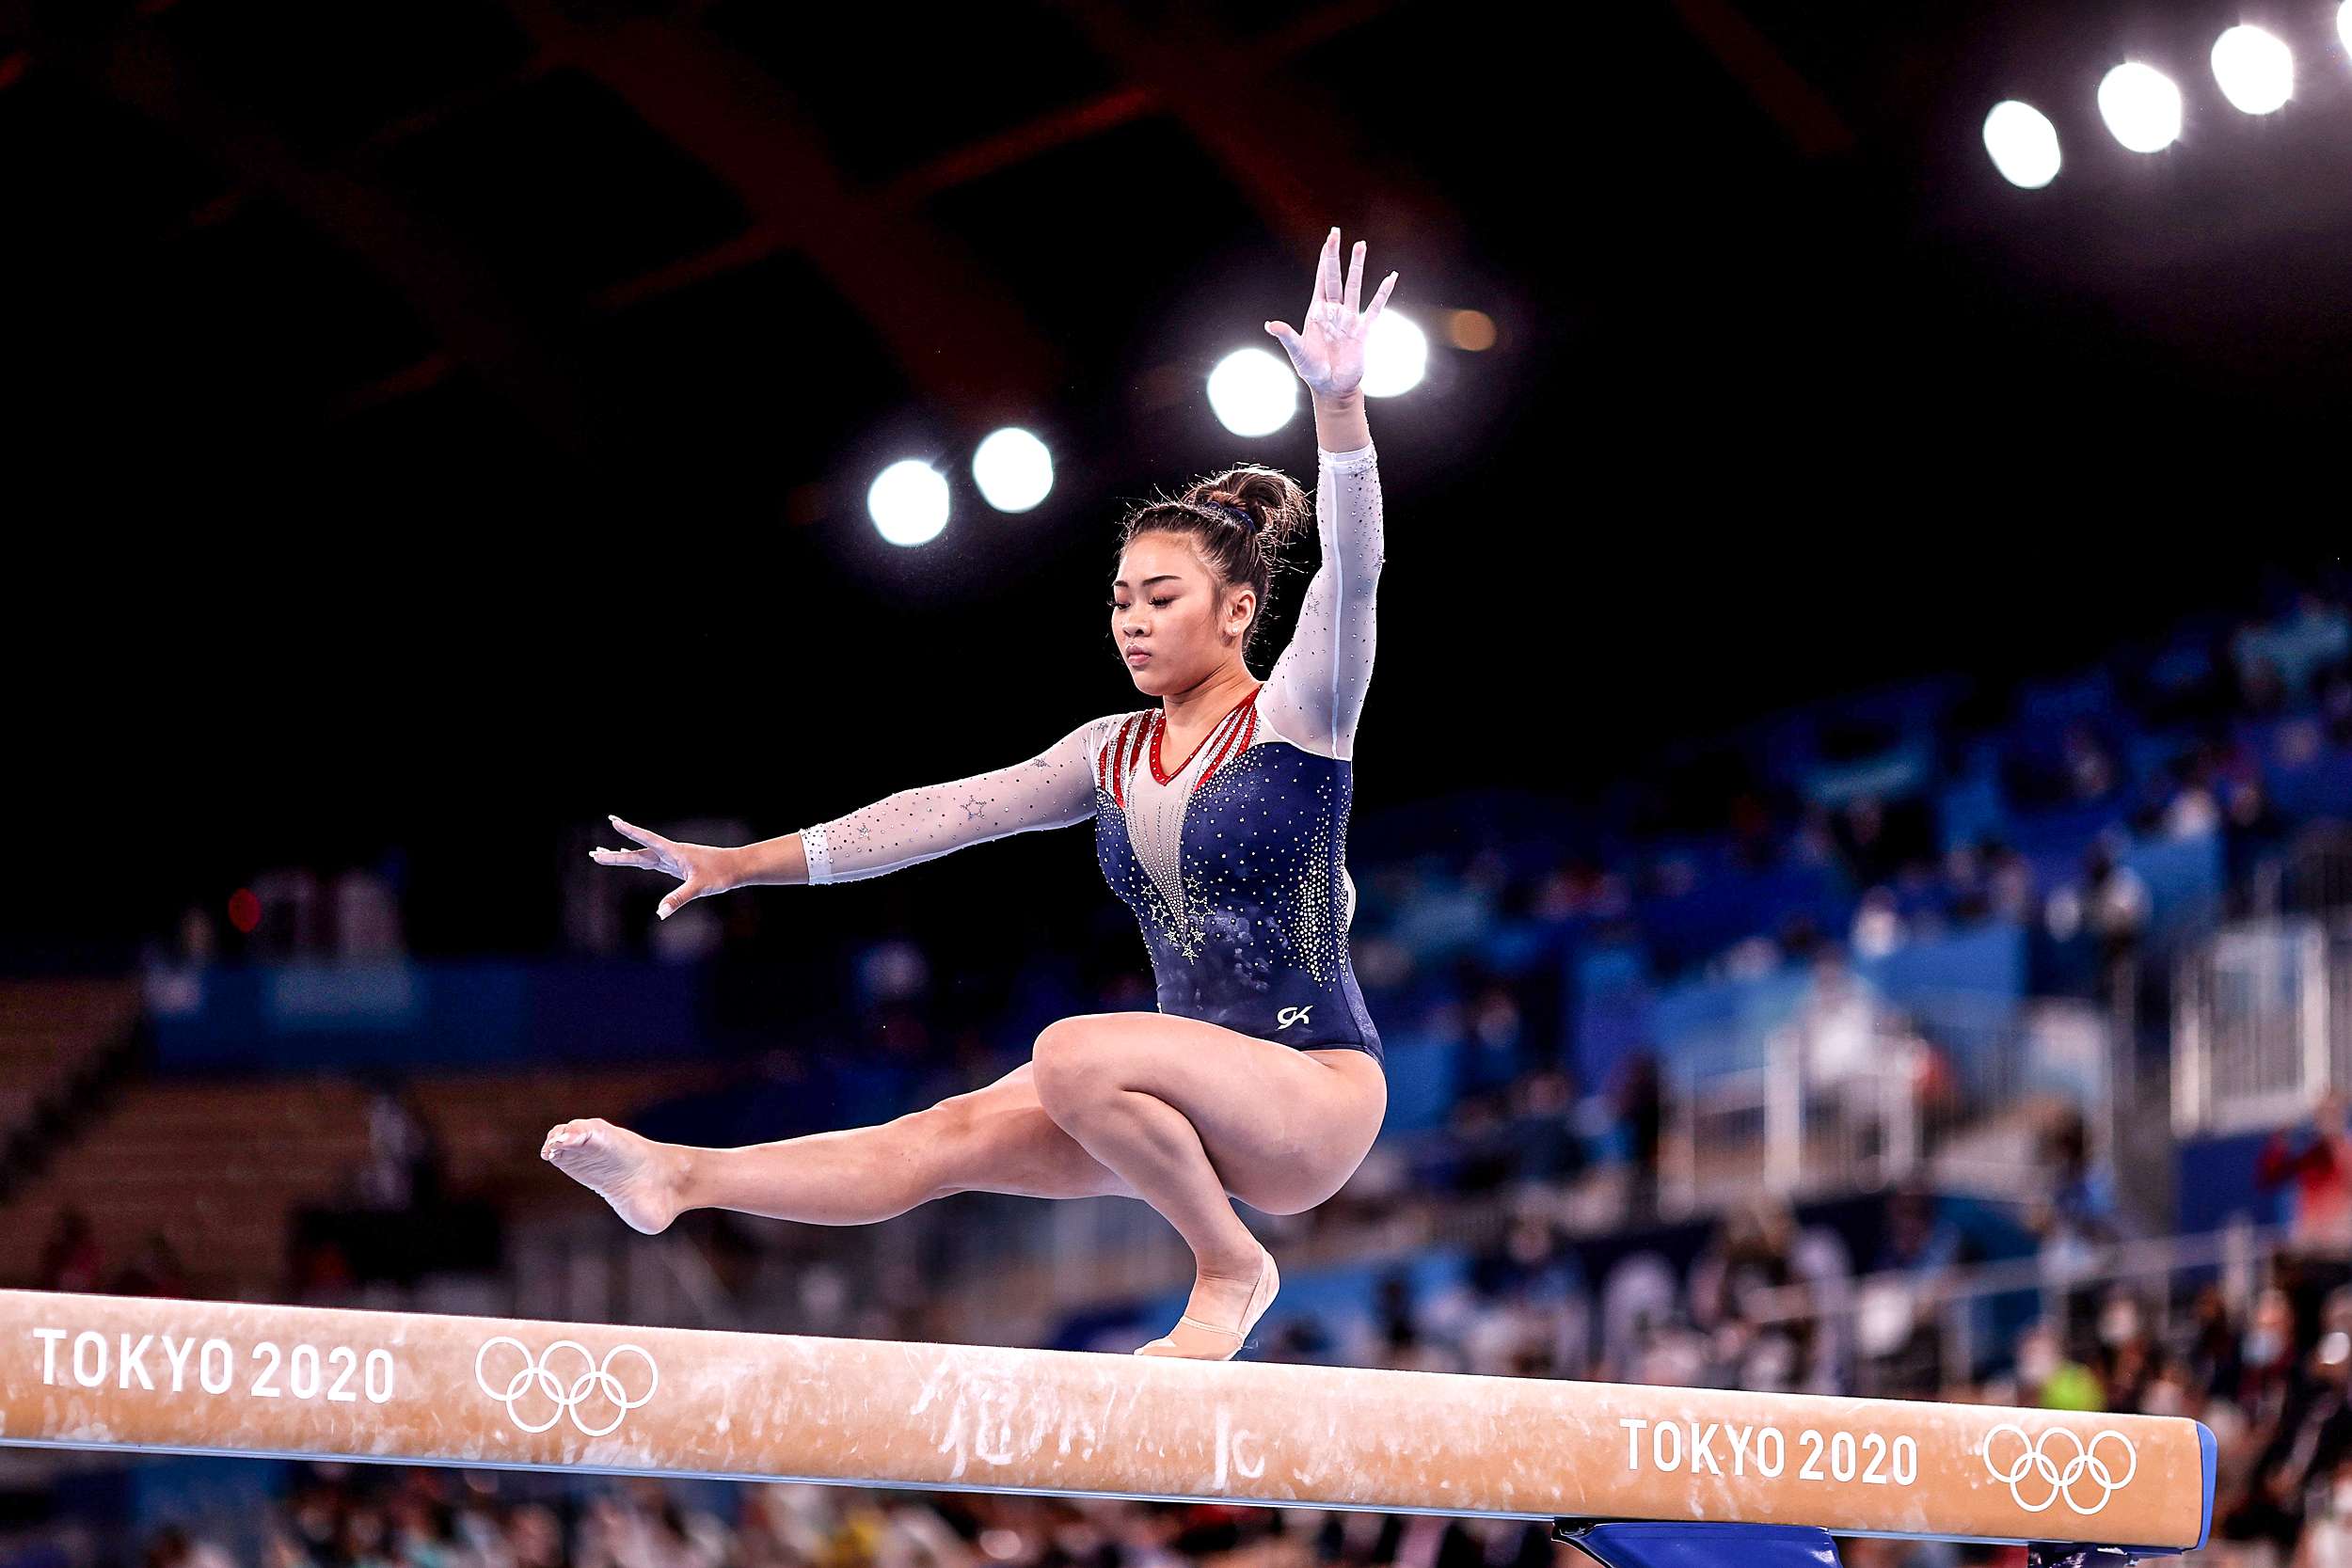 Asian Americans celebrate gymnast Suni Lee making history